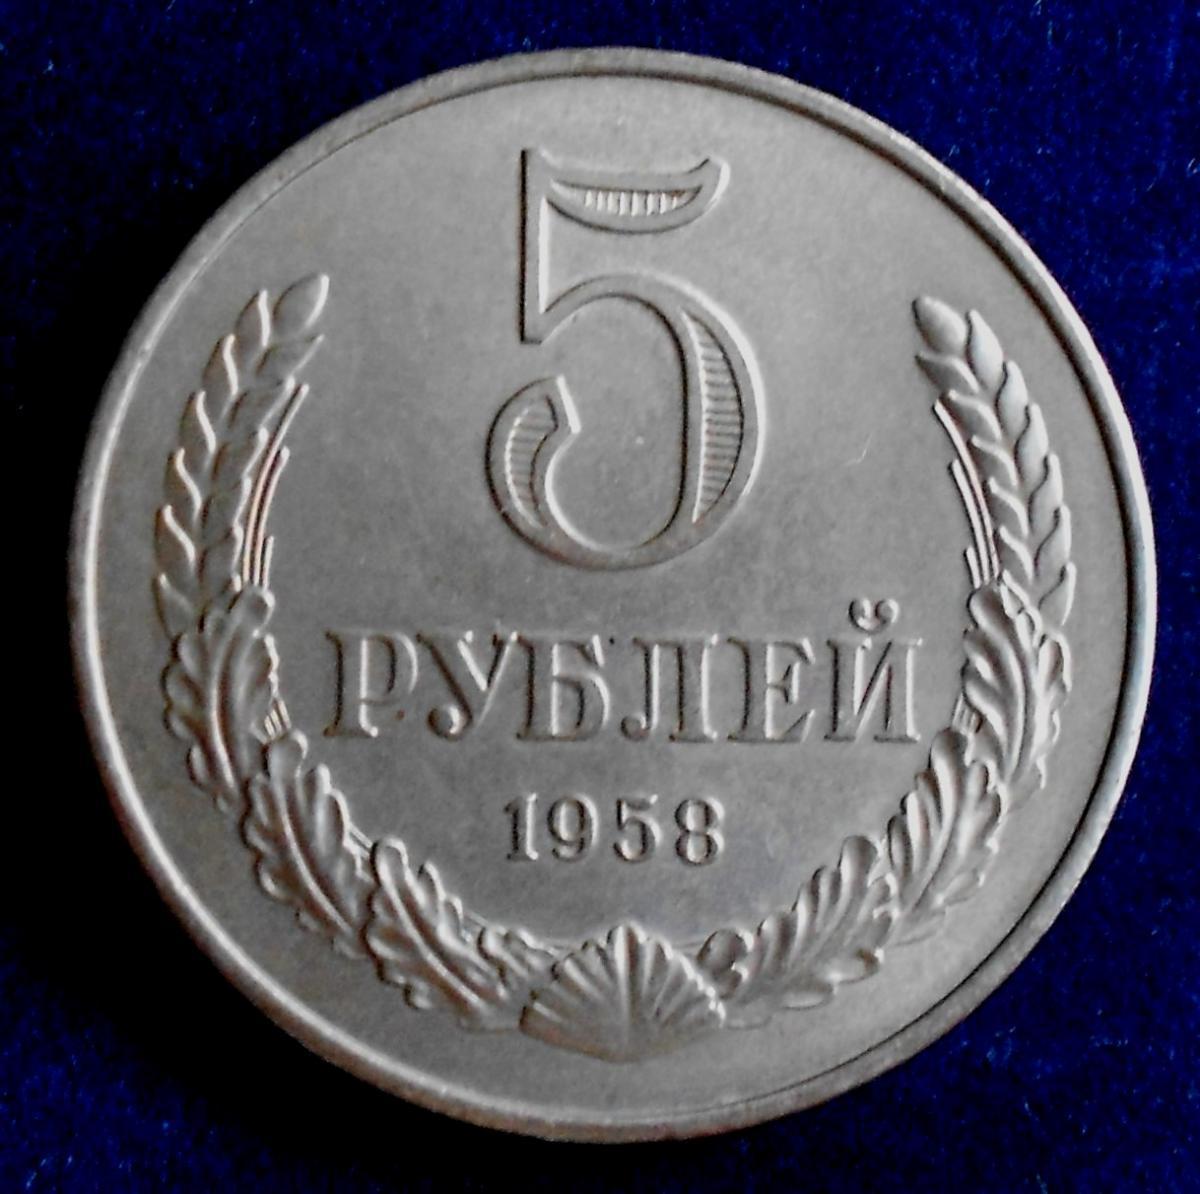 5 рублей 1958 г понял, как